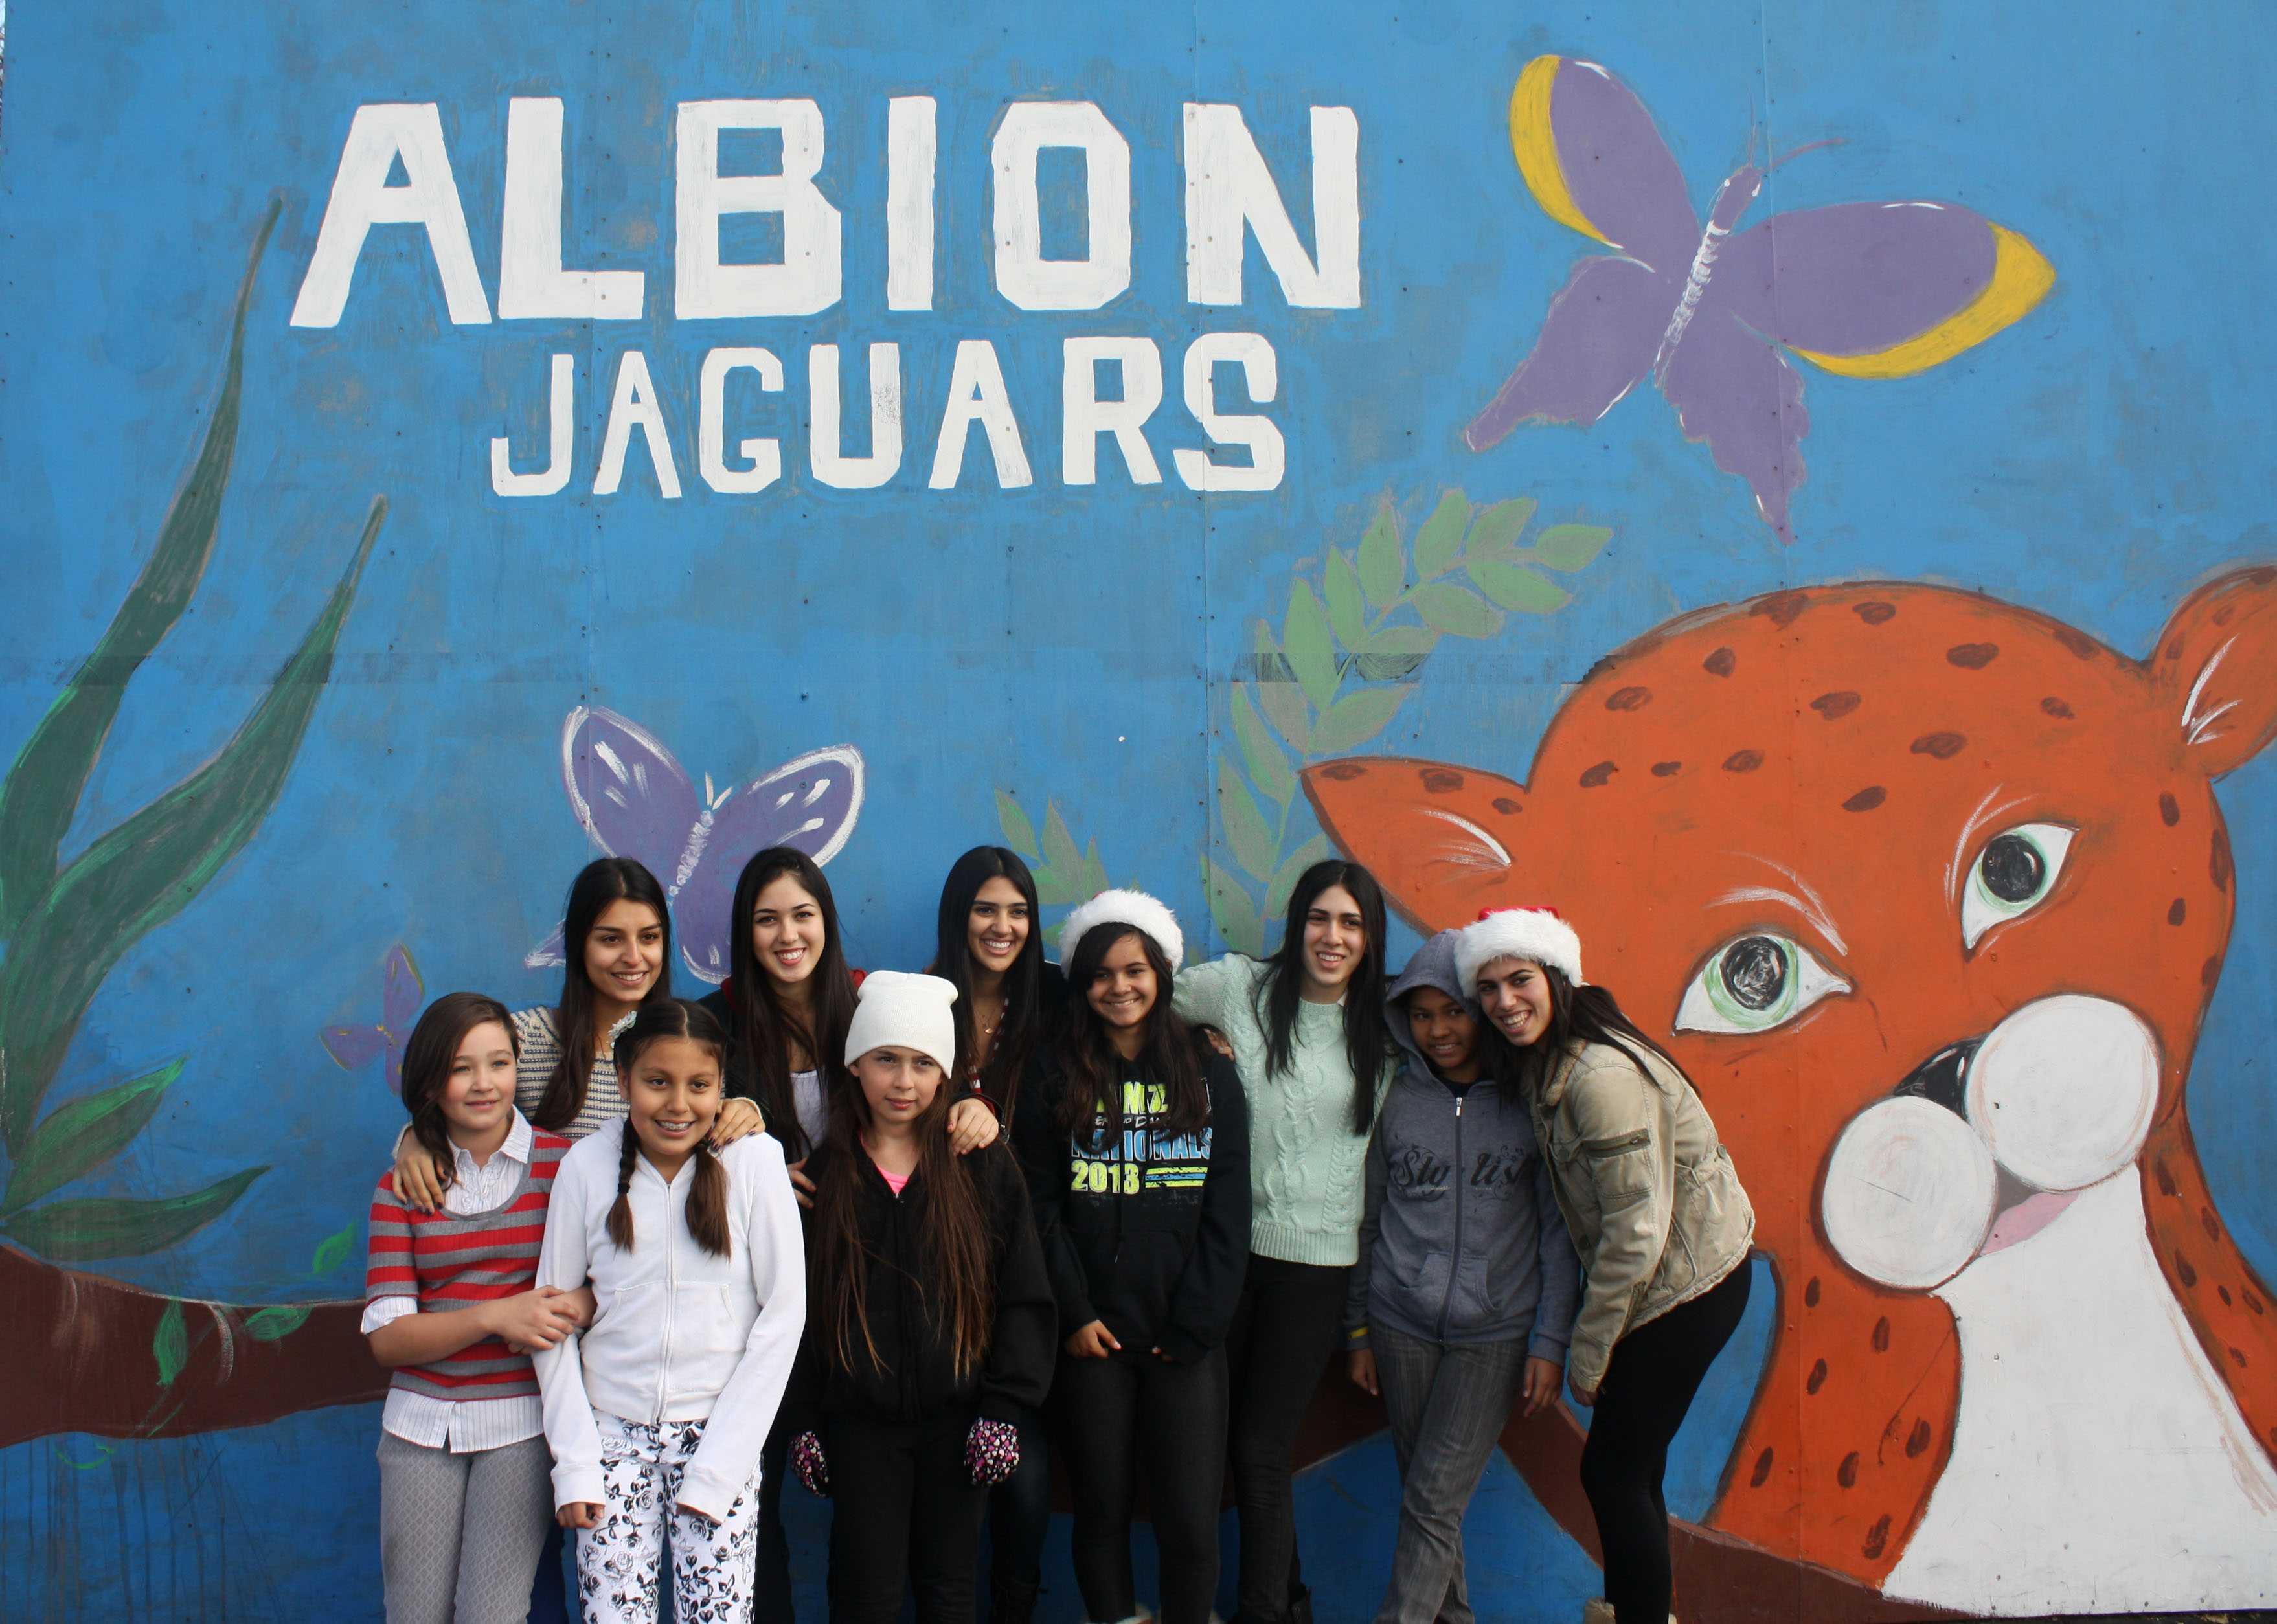 Seniors Jessica Mehraban, Nicole Mehdian, Daniella Ashoori, Brenda Mehdian and Celine Hakimianpour pose with Albion students.